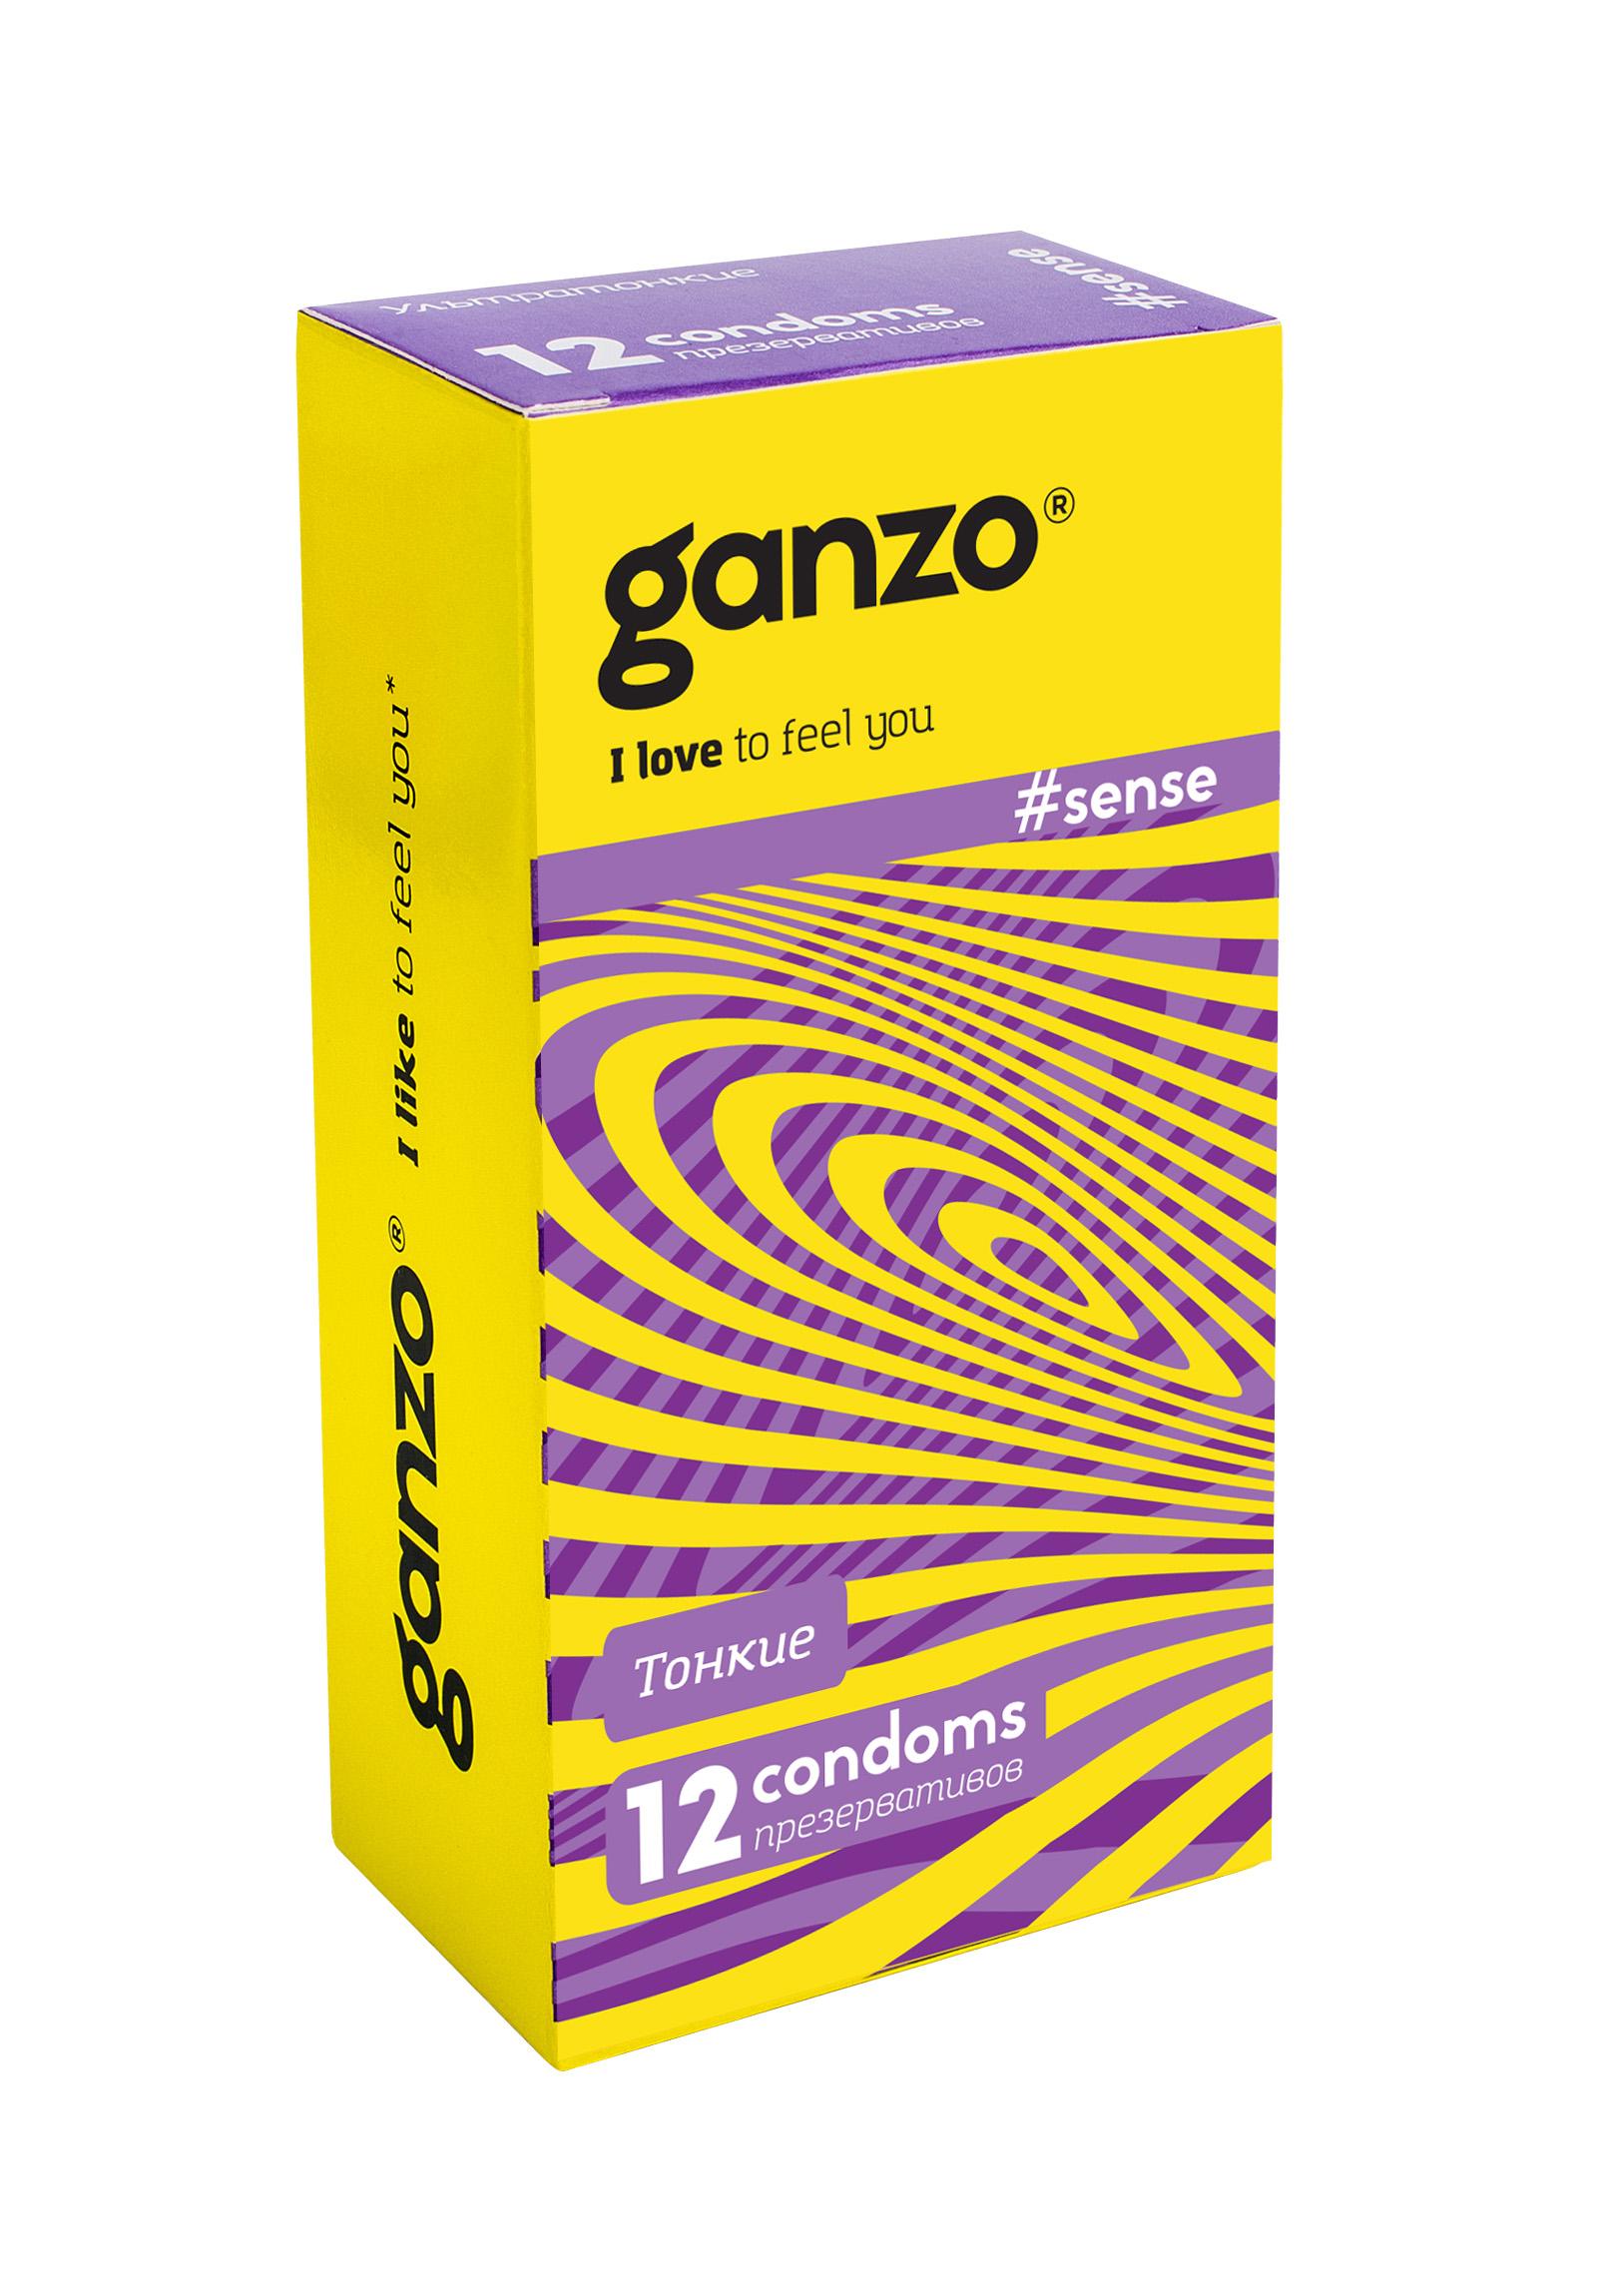 Ганзо презервативы №12 сенс